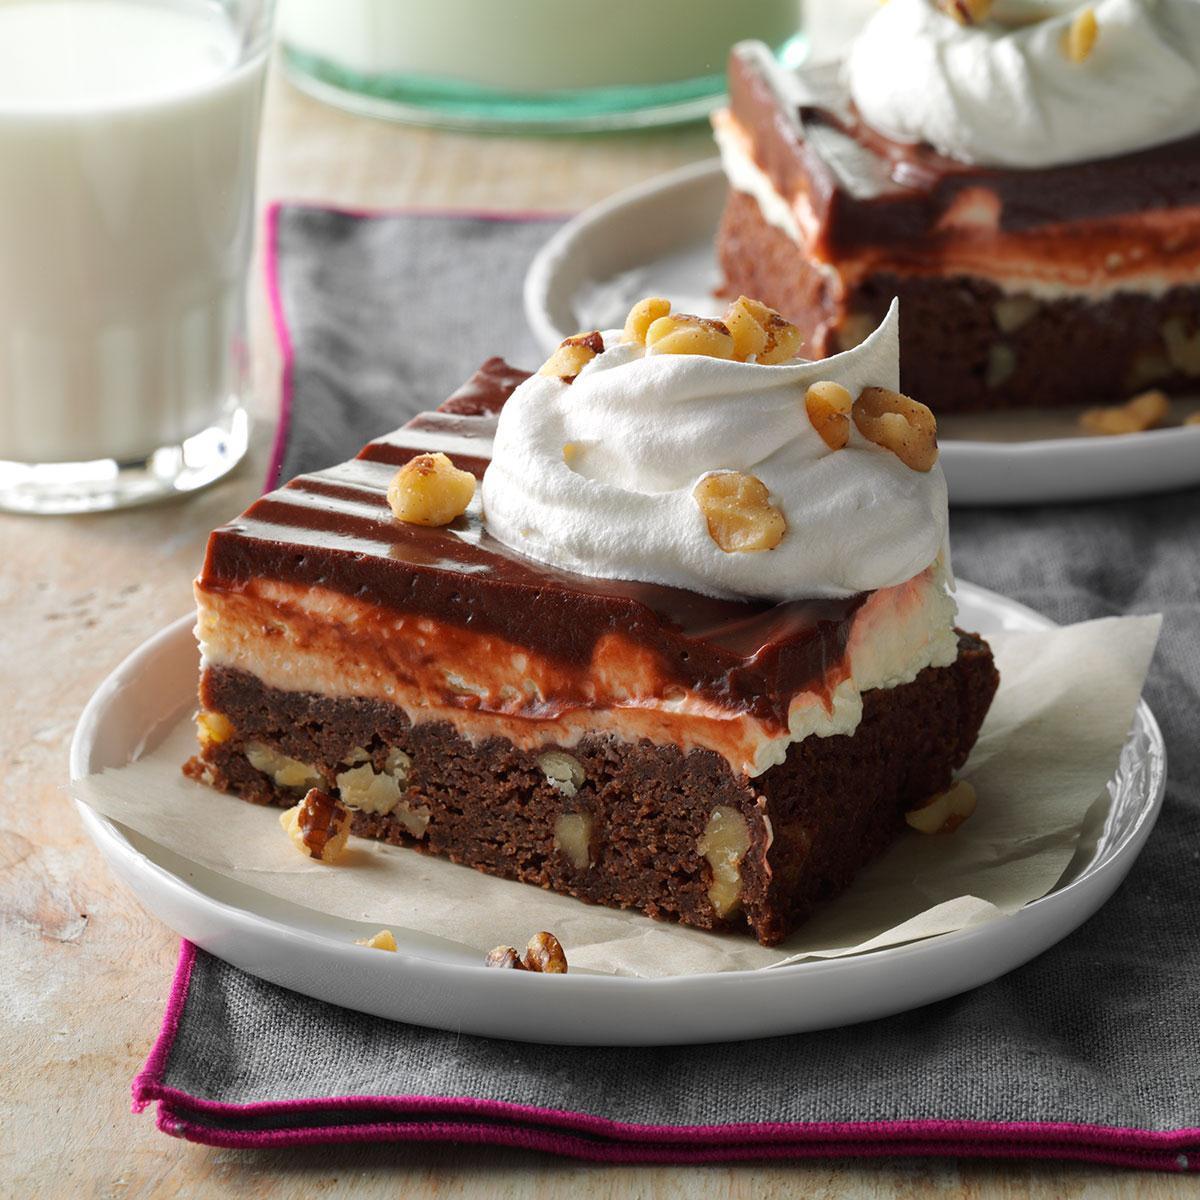 Layered Pudding Desserts  Layered Brownie Dessert Recipe